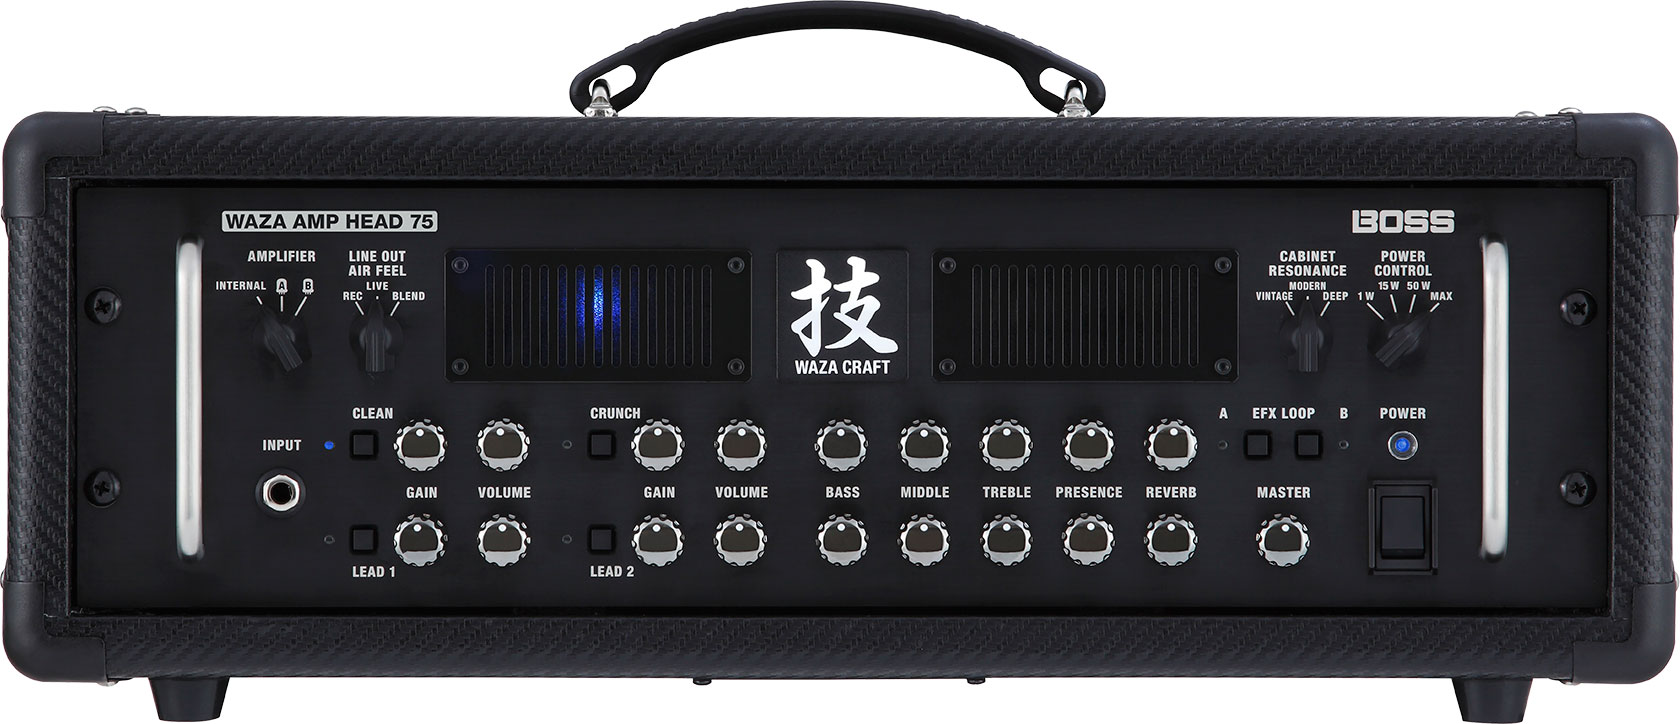 boss waza amp head 75 guitar amplifier. Black Bedroom Furniture Sets. Home Design Ideas